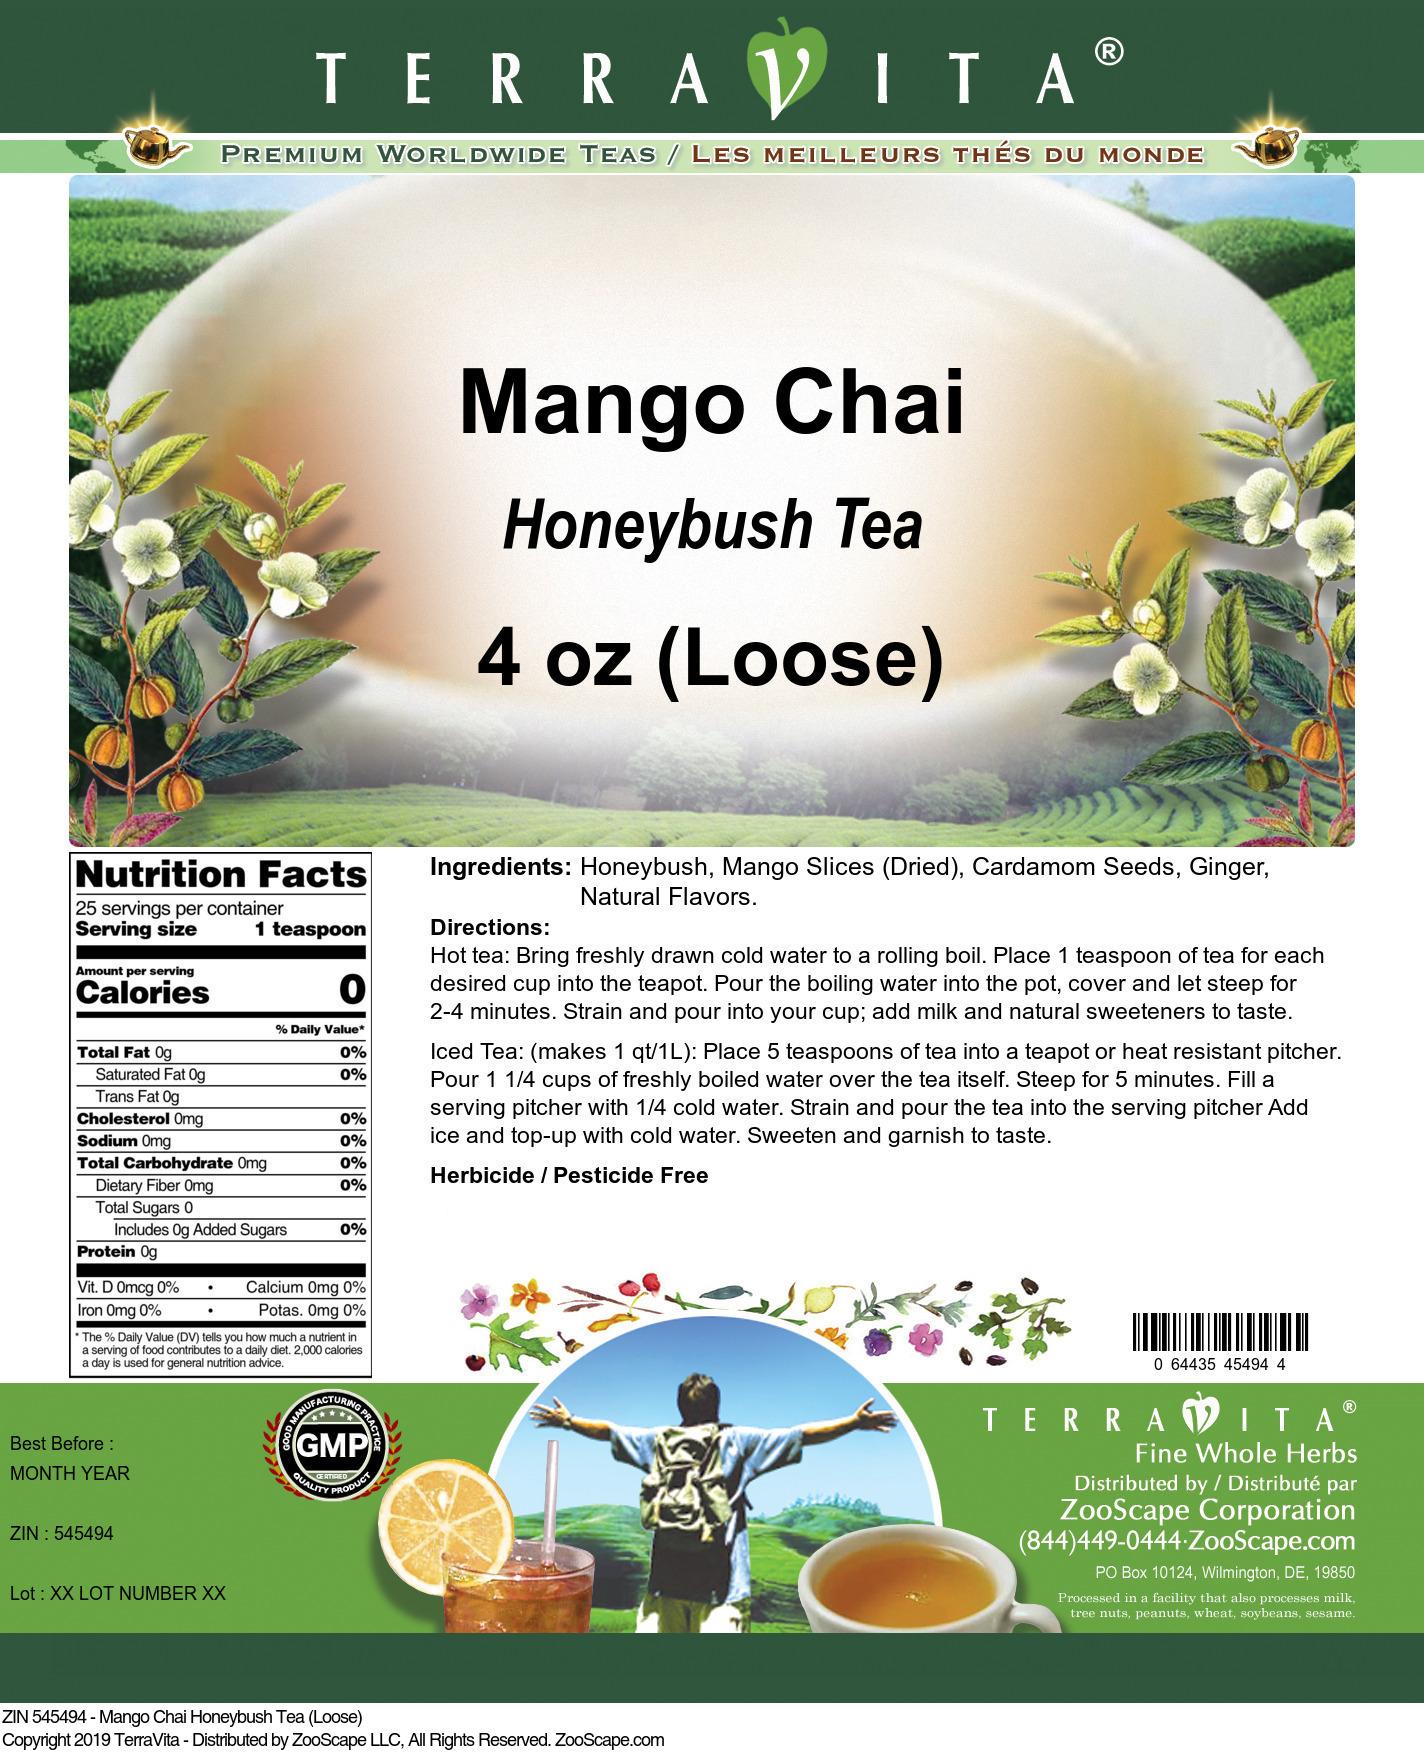 Mango Chai Honeybush Tea